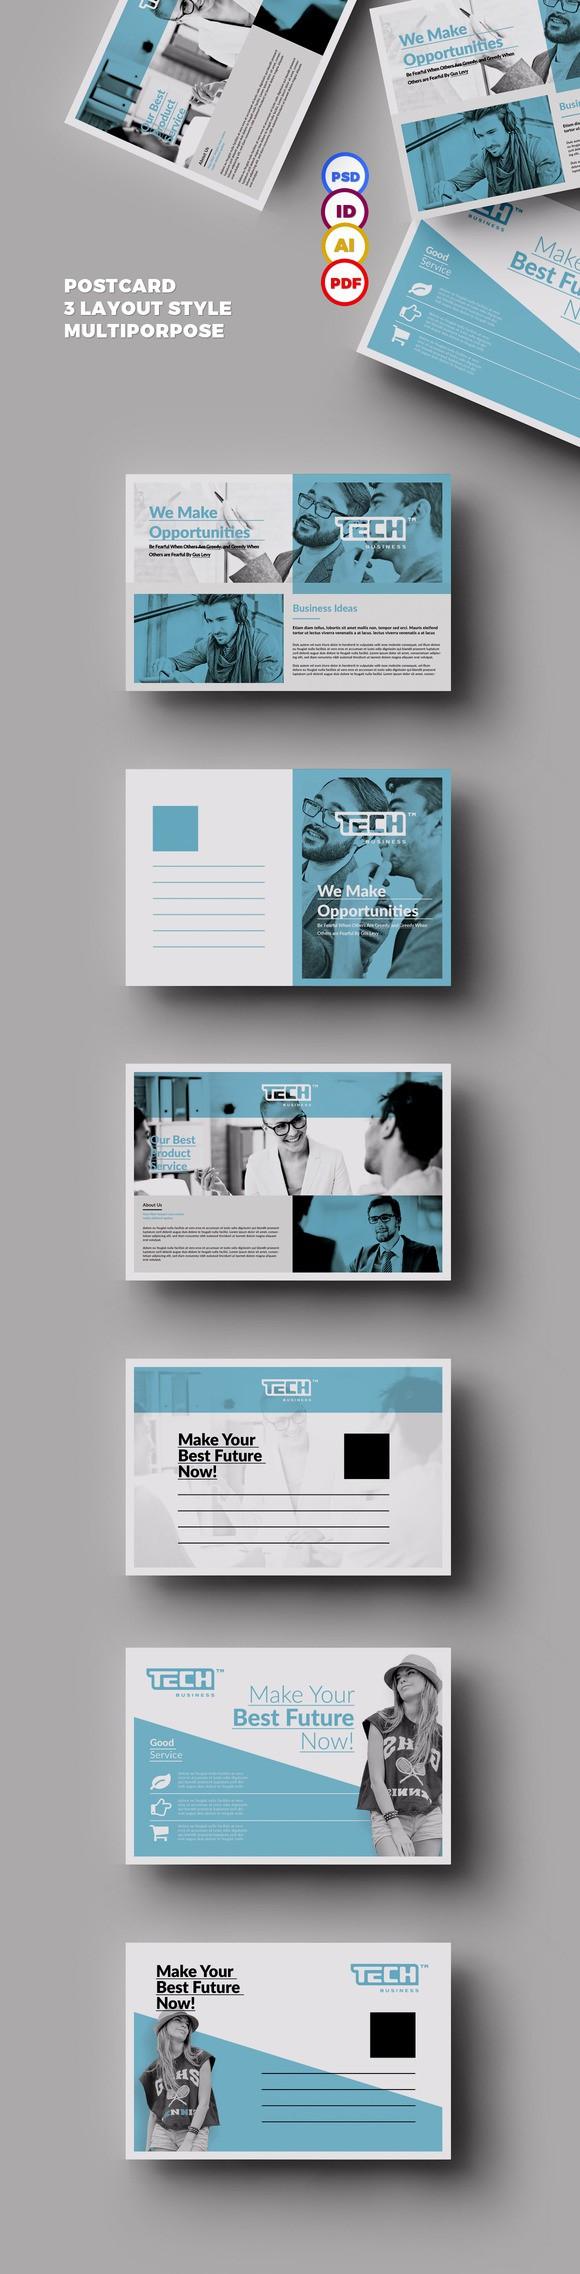 Postcard Business Postcards Postcard Design Postcard Design Inspiration